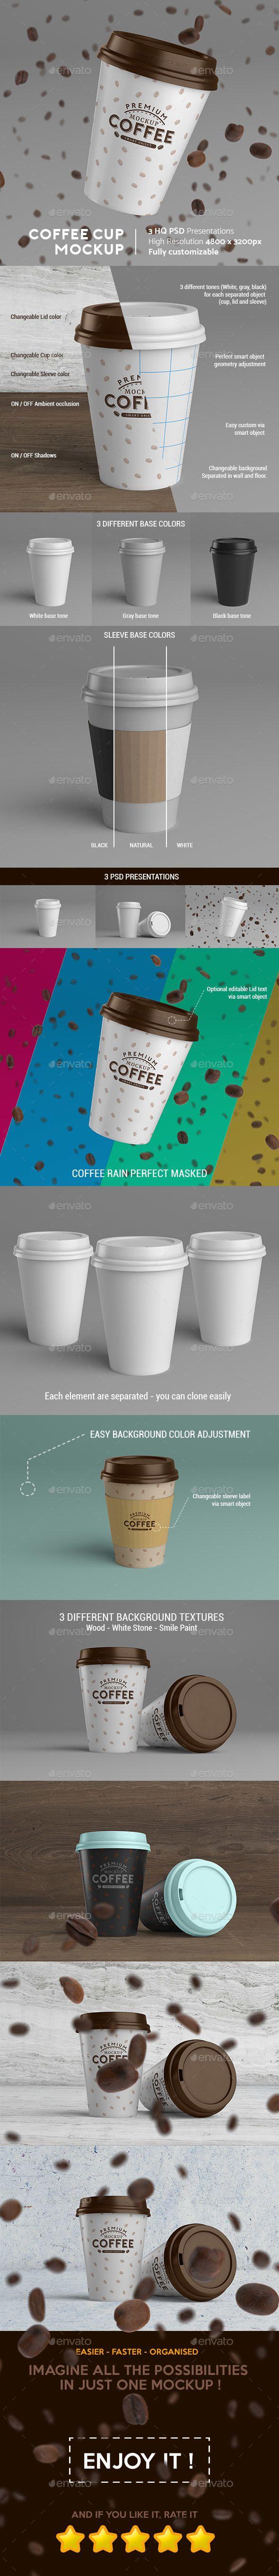 Coffee Cup MockUp Food and Drink Packaging